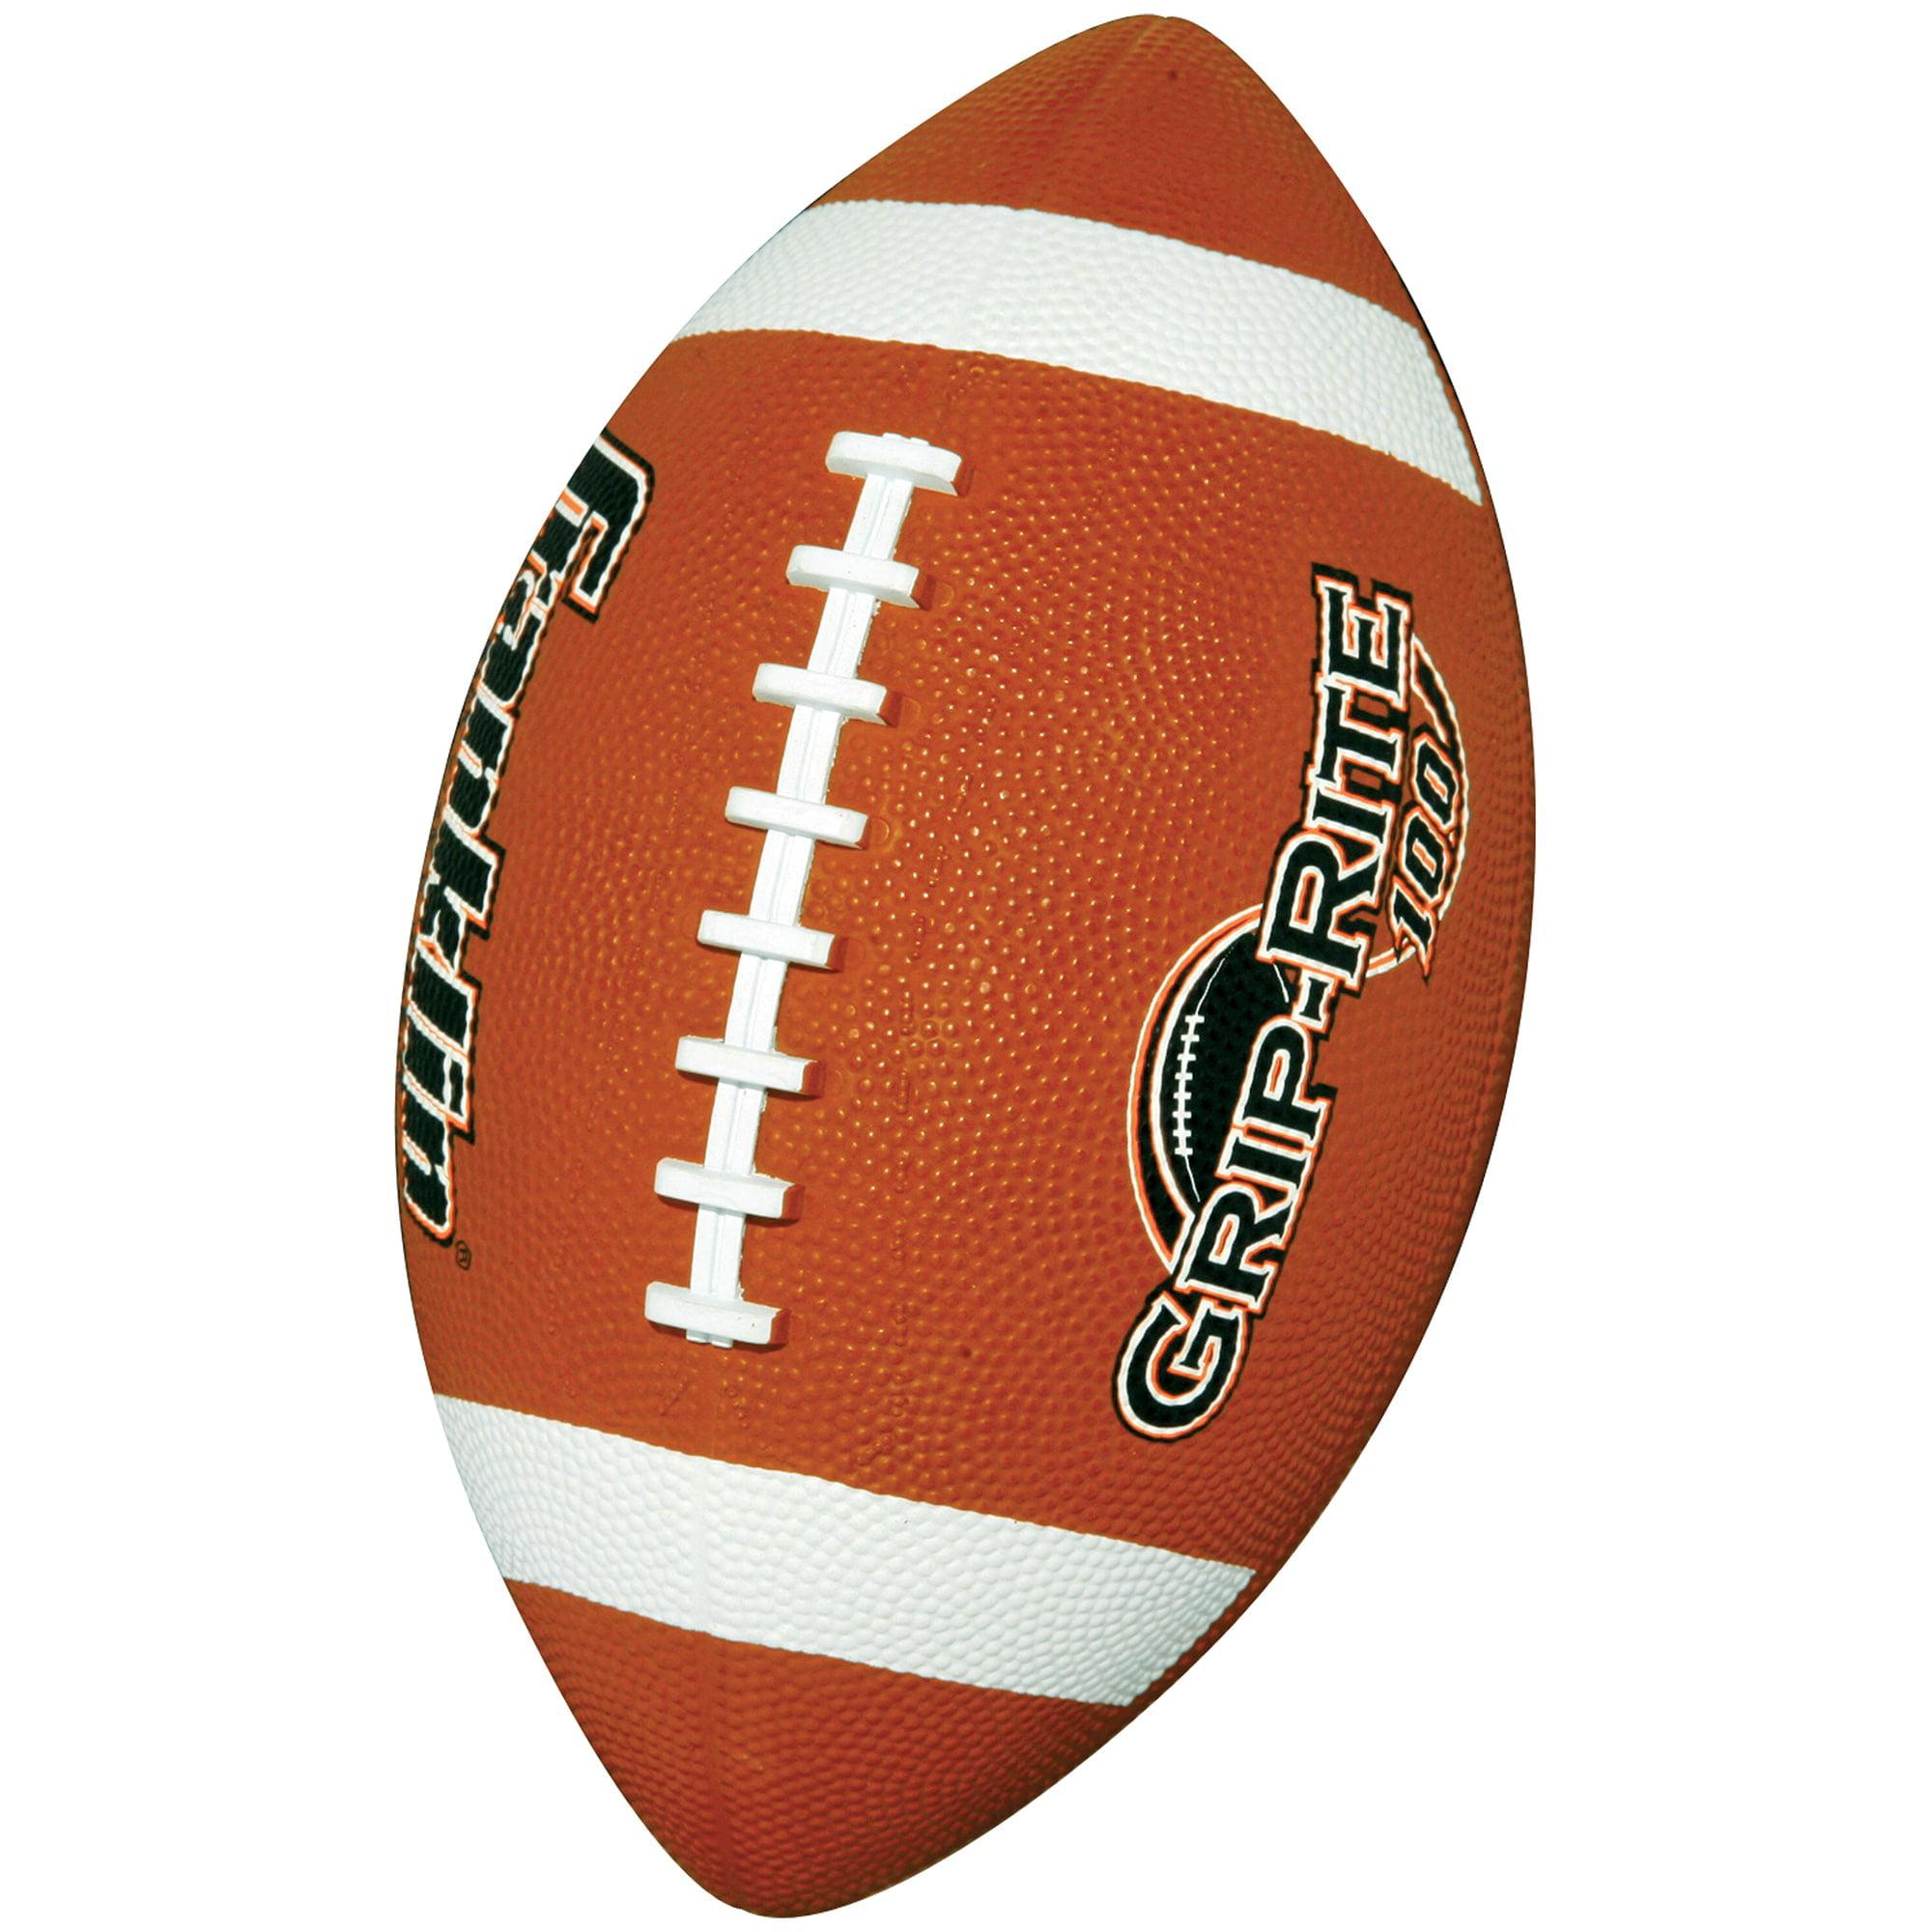 Franklin Sports Grip-Rite 100 Rubber Football, Junior by Franklin Sports